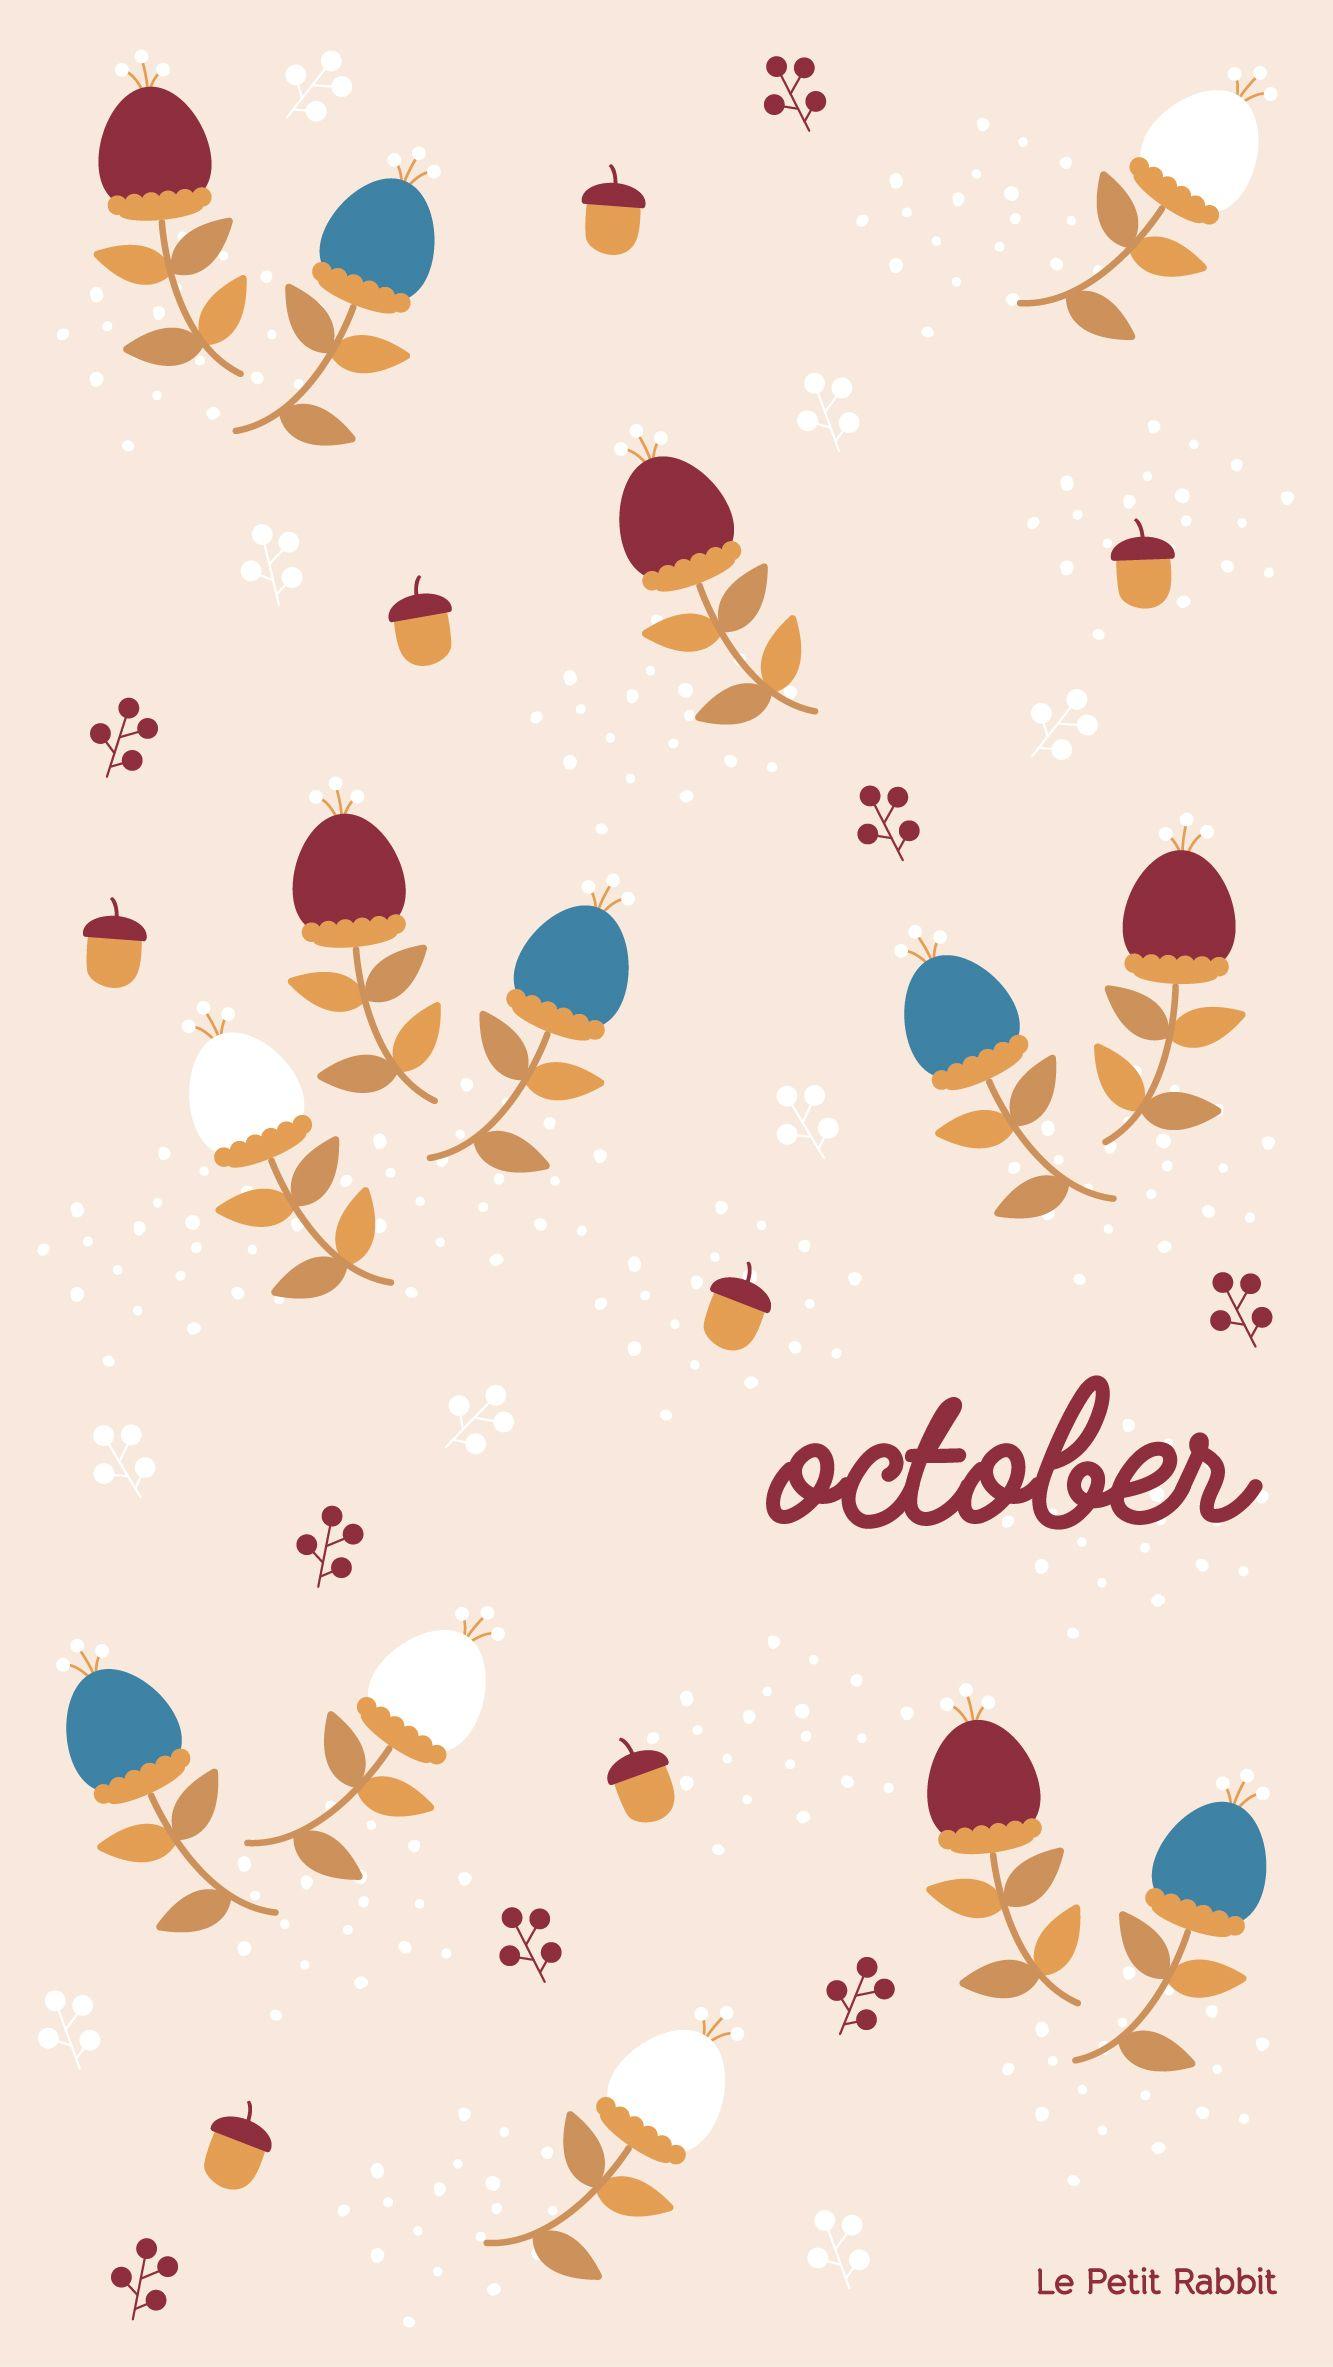 October wallpaper iPhone #octoberwallpaperiphone